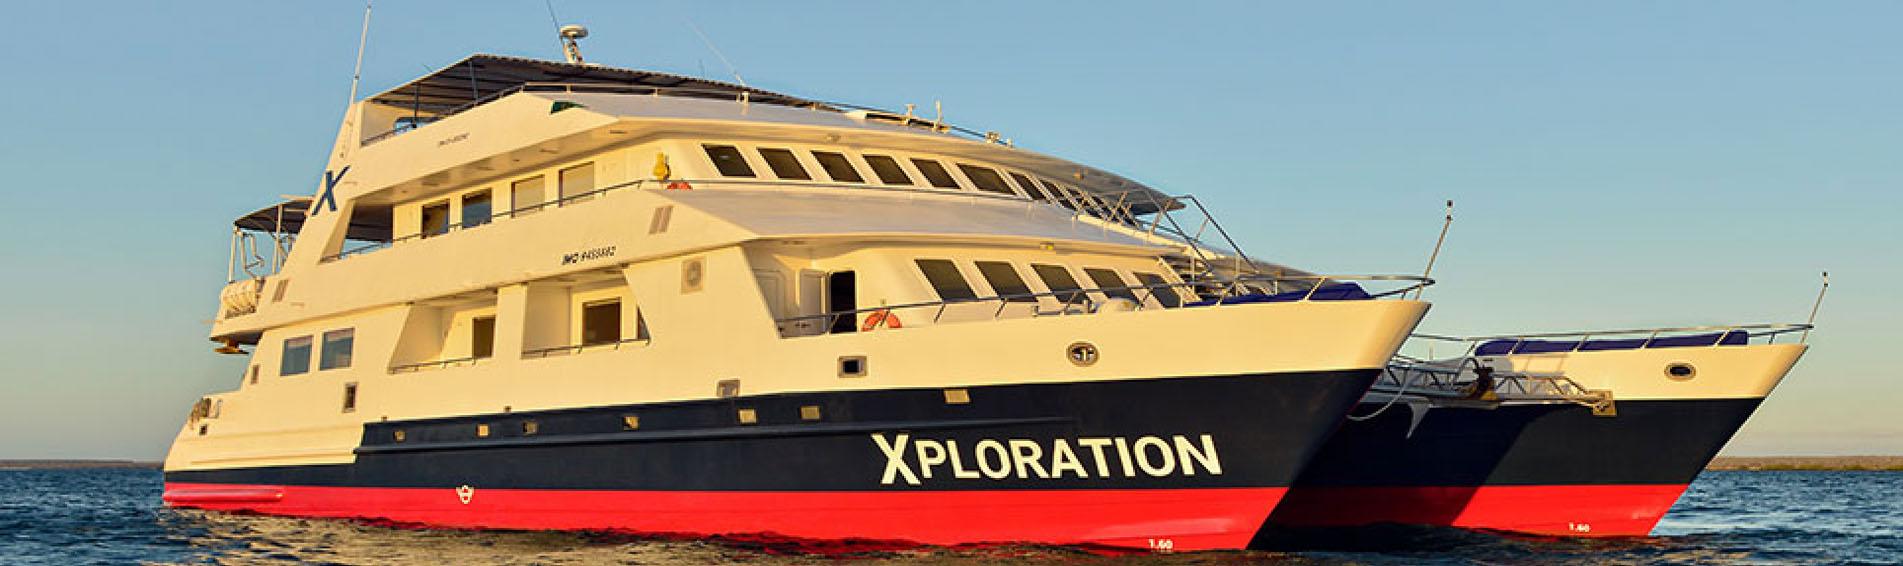 CELEBRITY XPLORATION side view profile